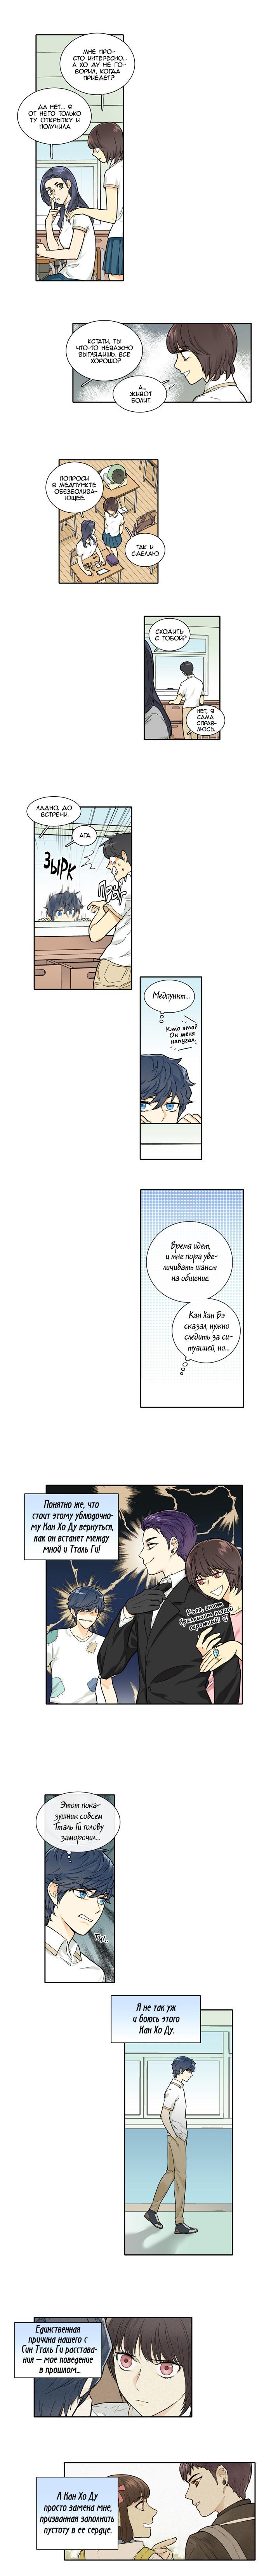 https://r1.ninemanga.com/comics/pic2/41/21609/305038/1467753847216.jpg Page 6